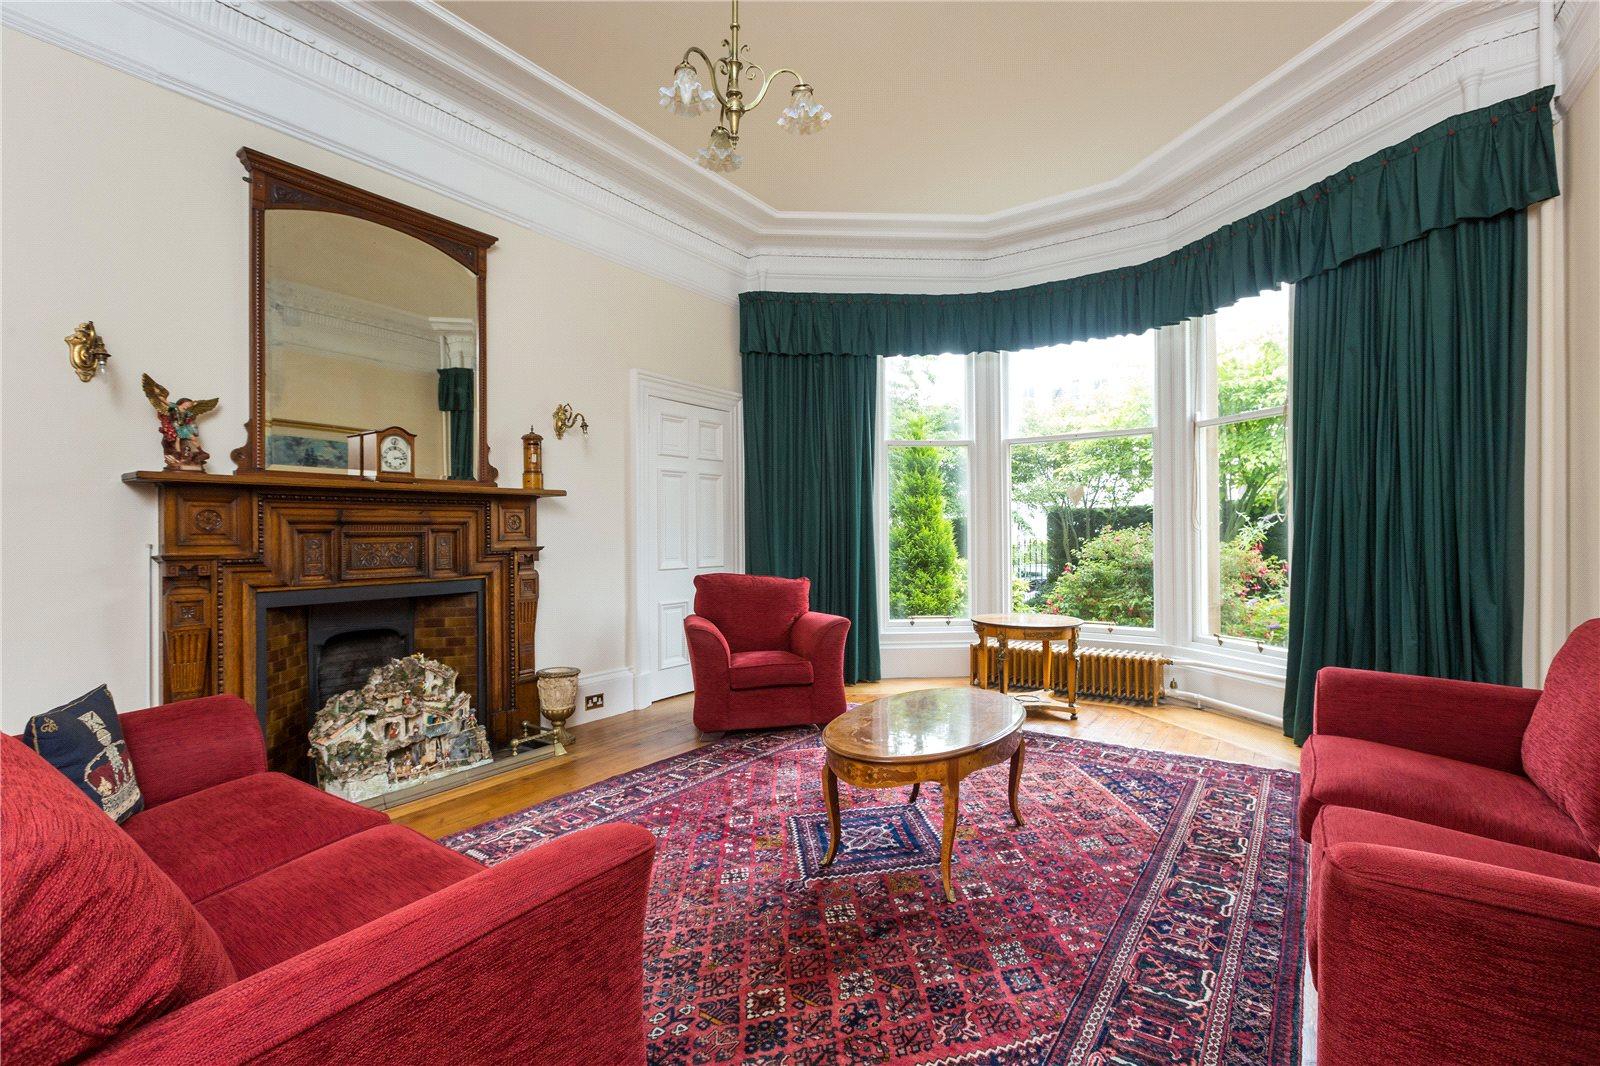 Single Family Home for Sale at Chalmers Crescent, Edinburgh, EH9 Edinburgh, Scotland